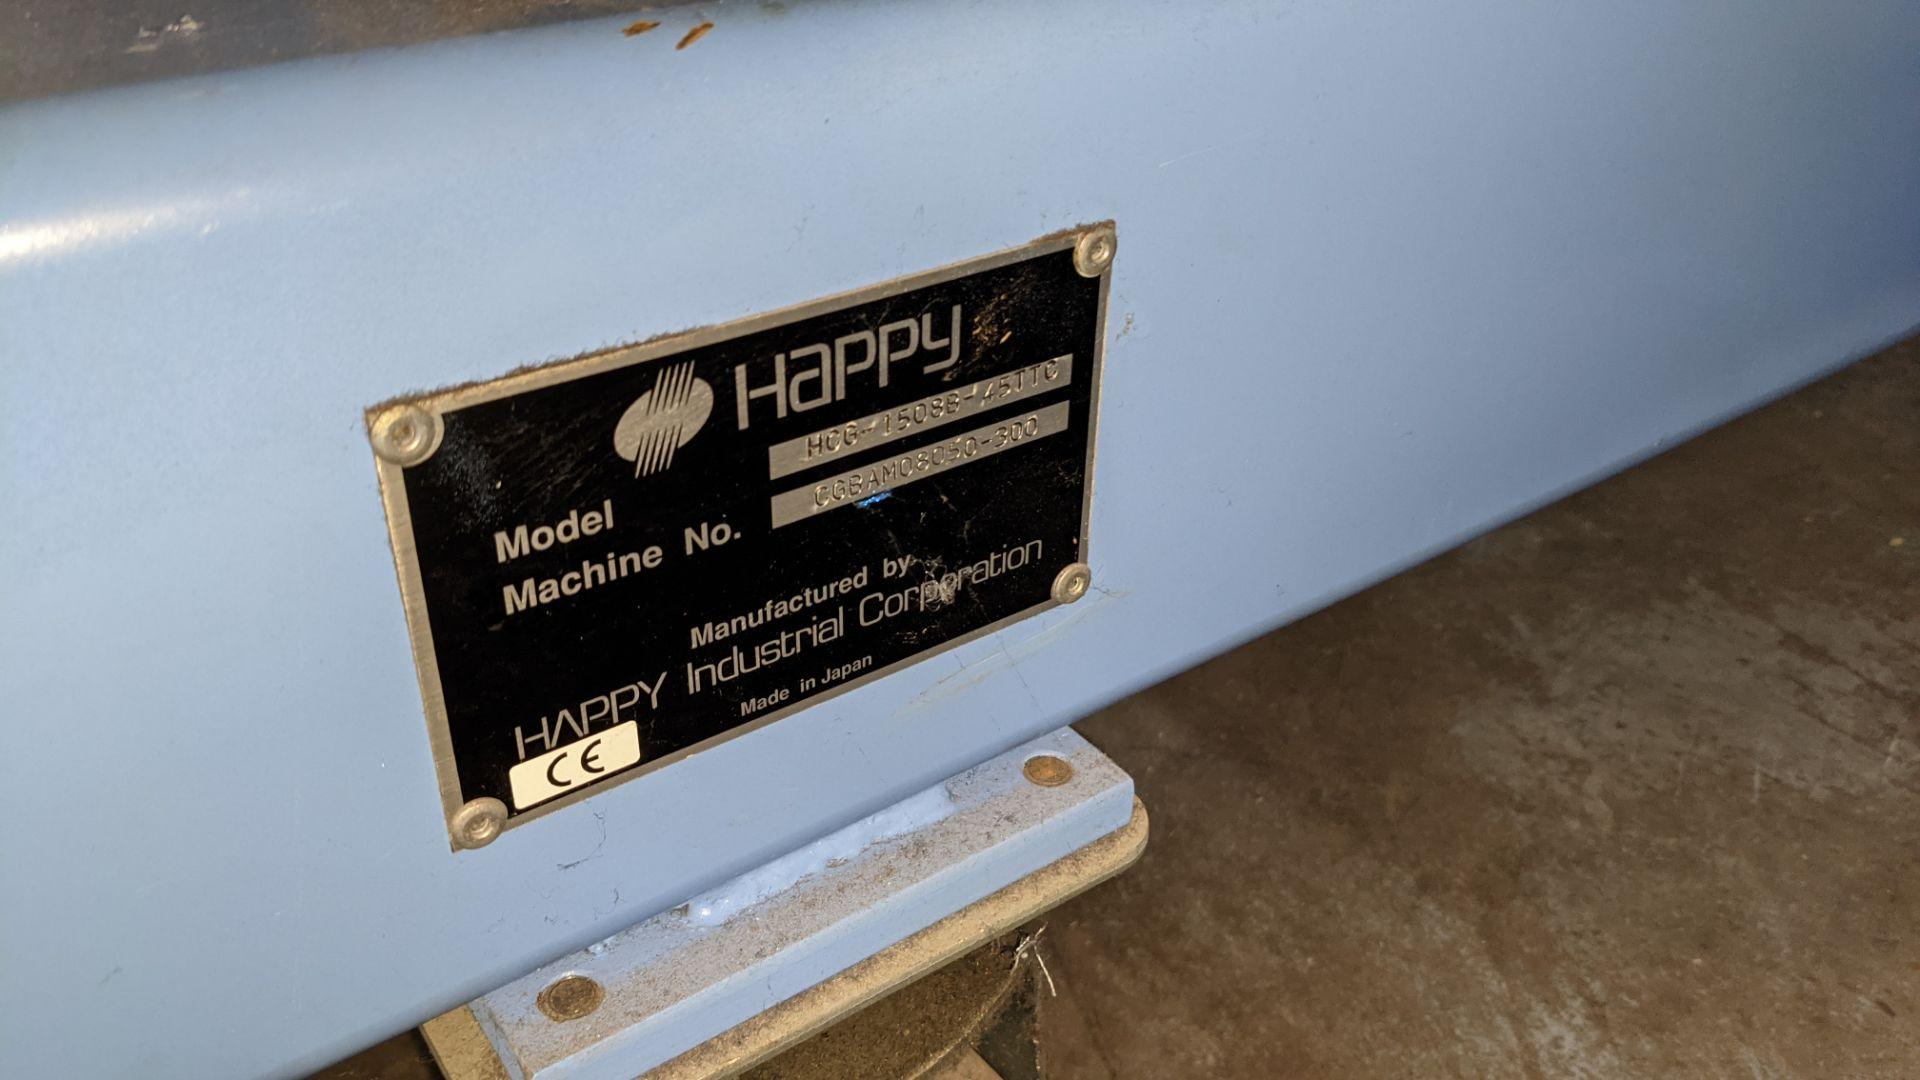 Happy 8 head embroidery machine, model HCG-1508B-45TTC, 15 needles per head, including frames & othe - Image 21 of 32